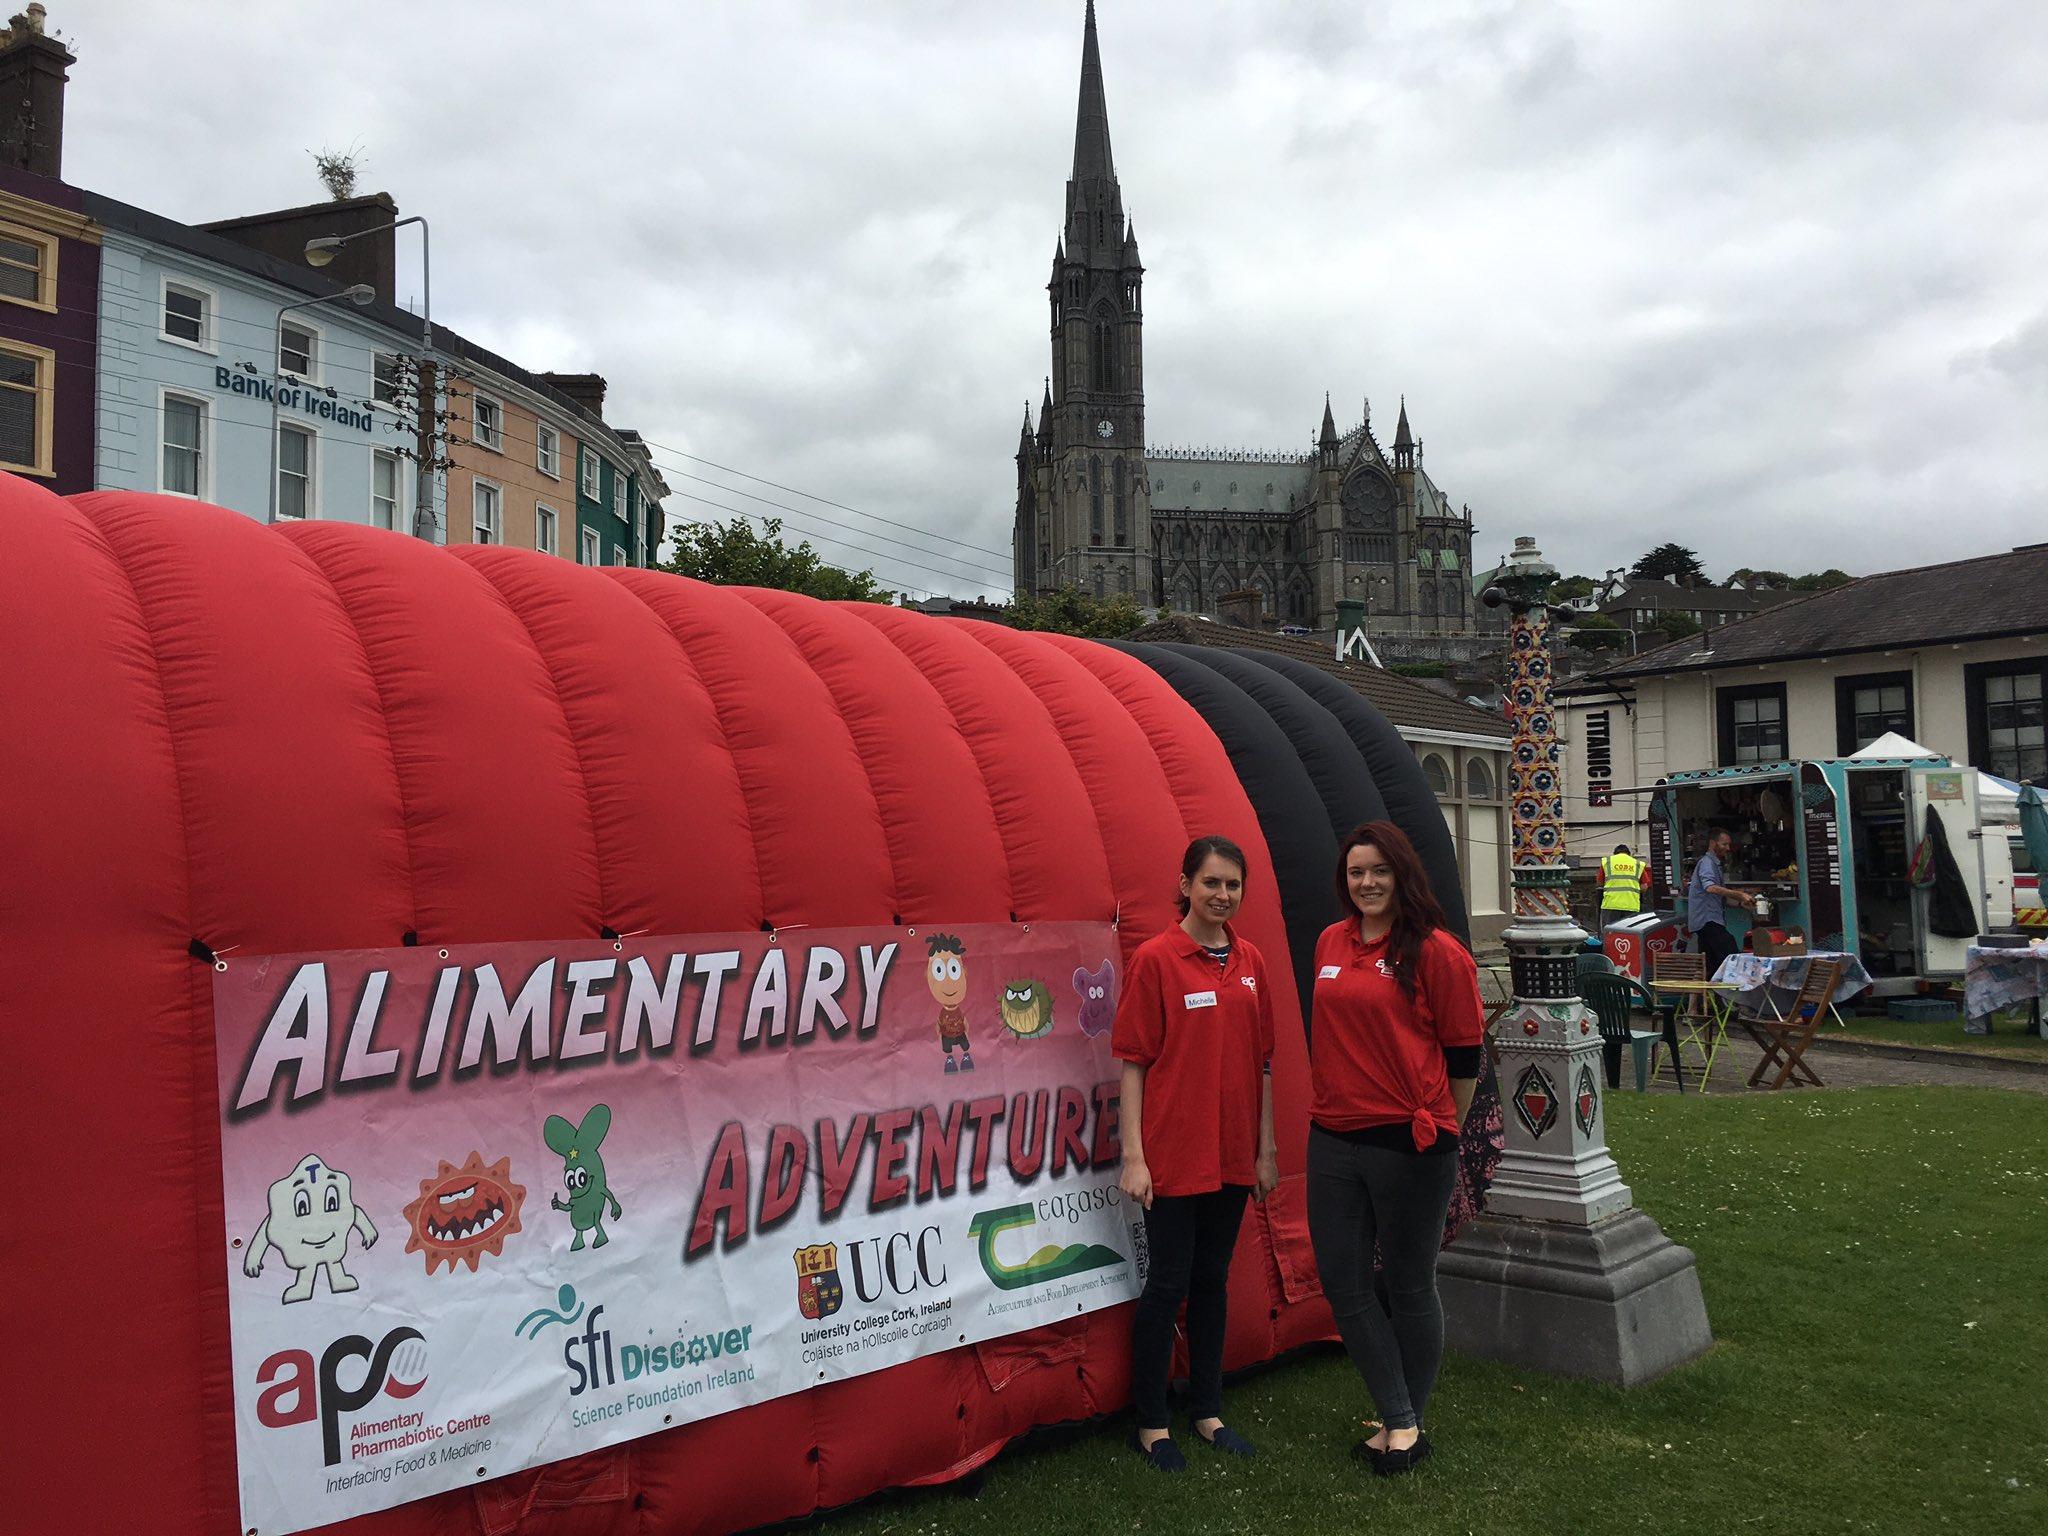 APC Microbiome Ireland On Twitter TedDinan Youre Not Hallucinatingalimentaryadventures Is The Promenade At Cobh Vitality Festival